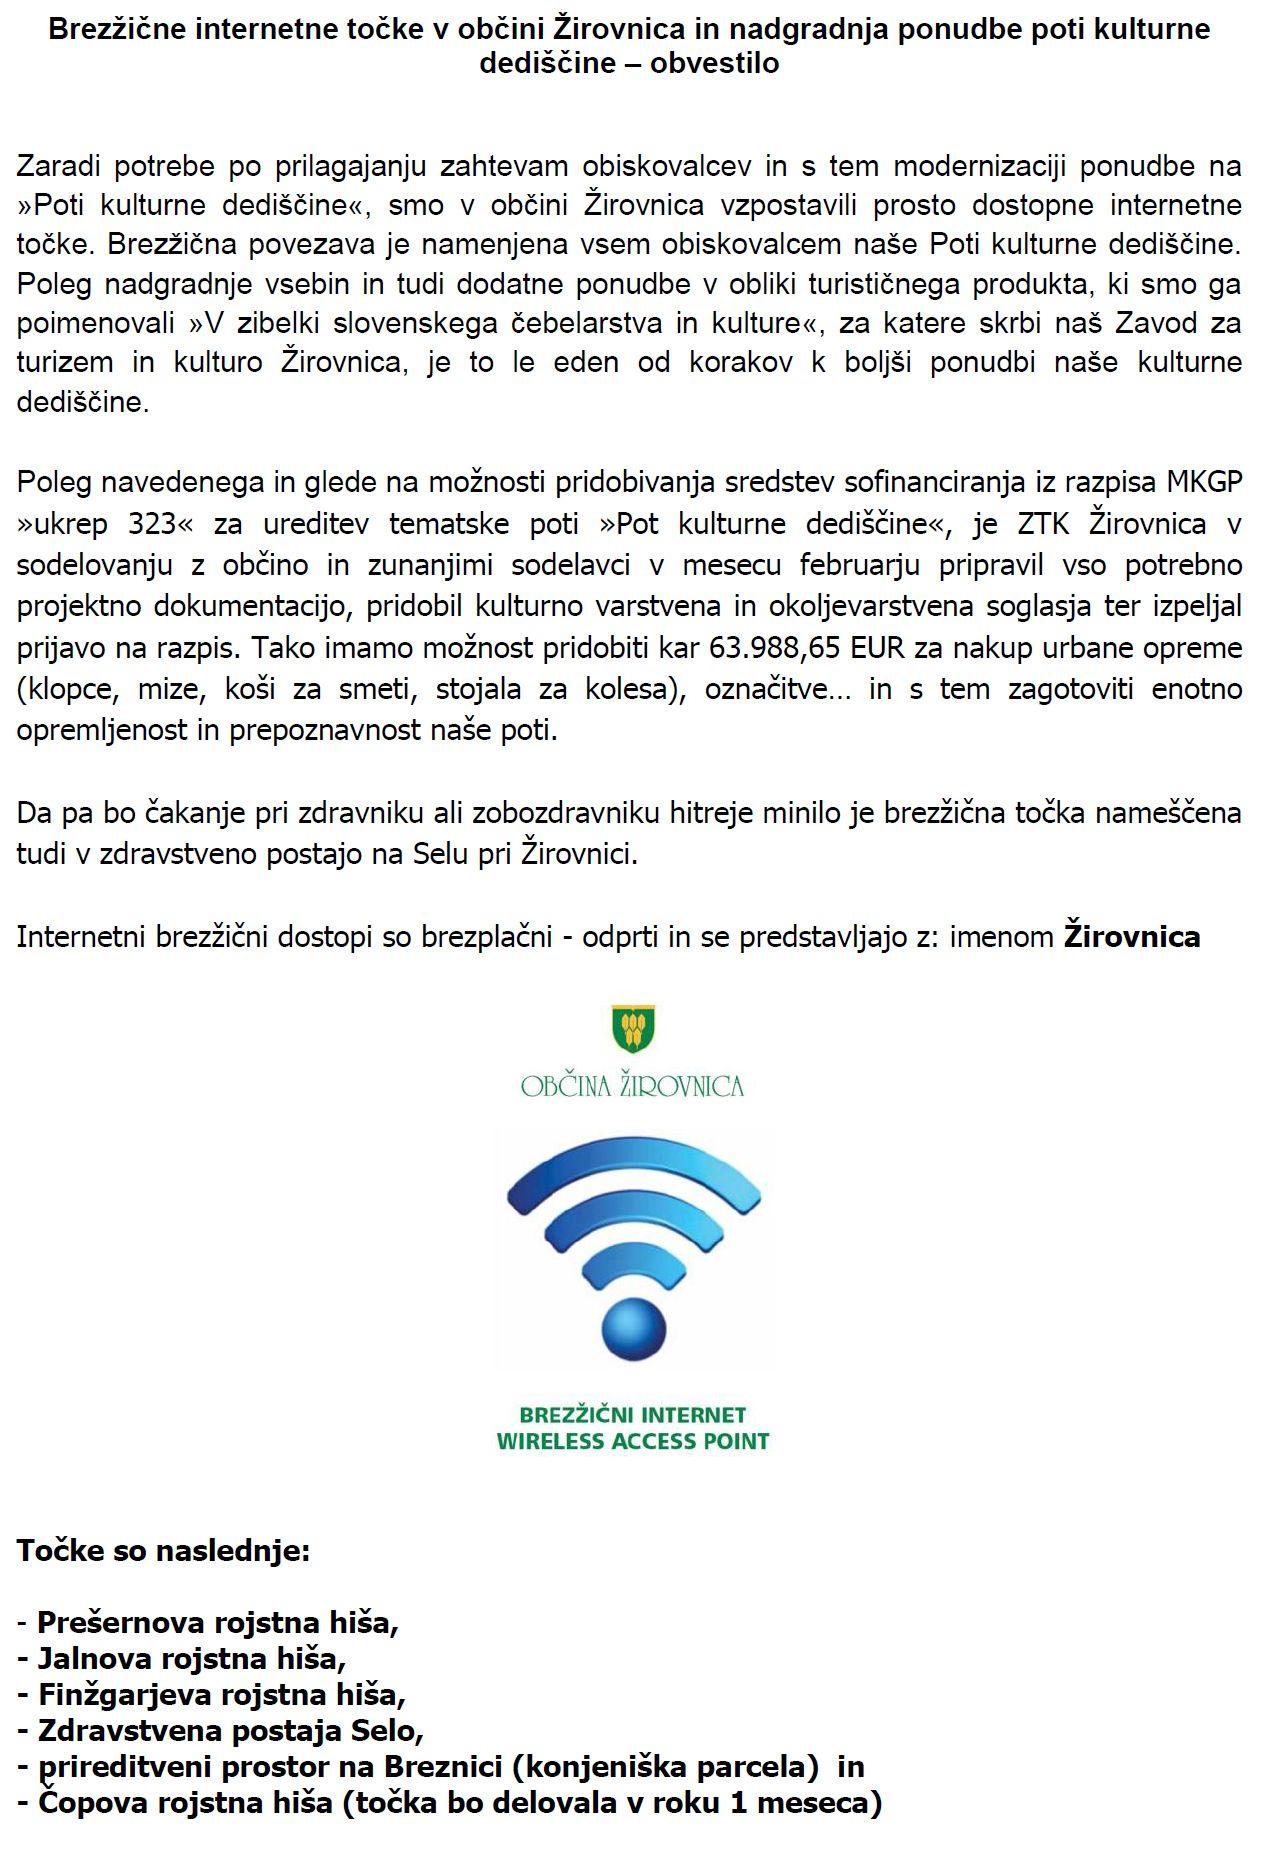 WI-FI - OBVESTILO(1)